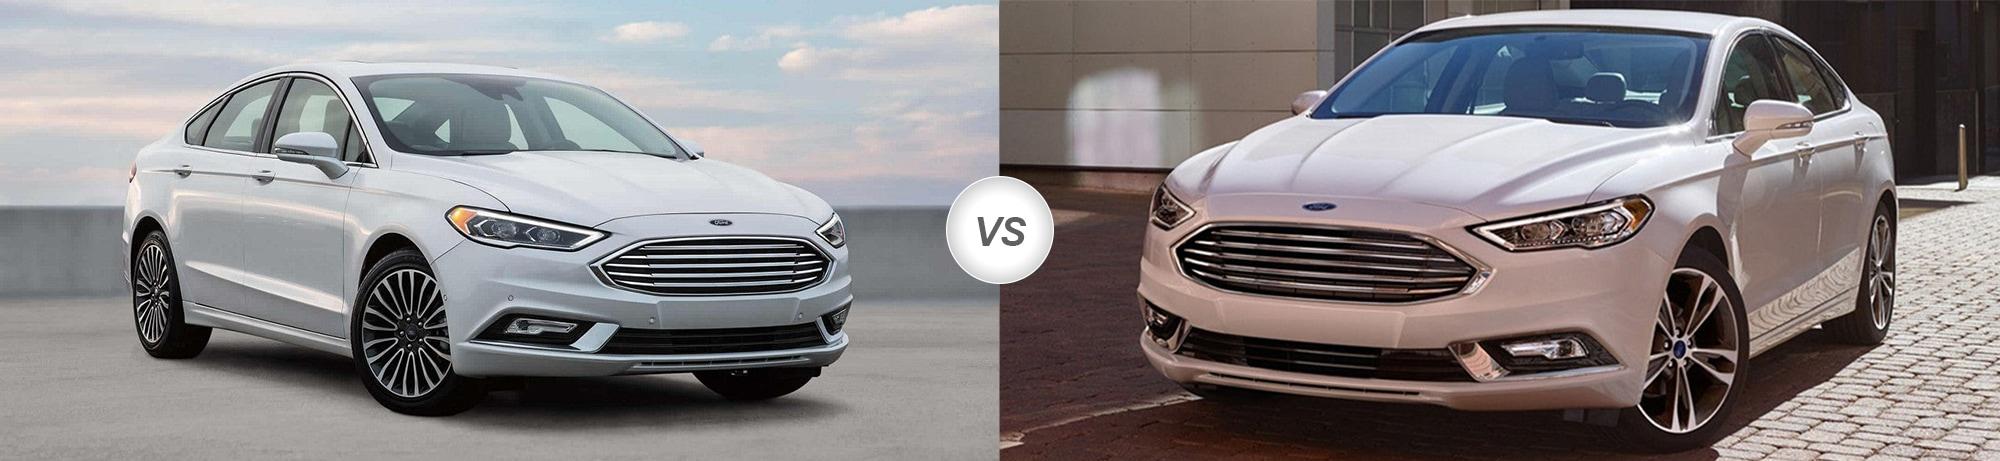 2018 Ford Fusion vs 2017 Ford Fusion